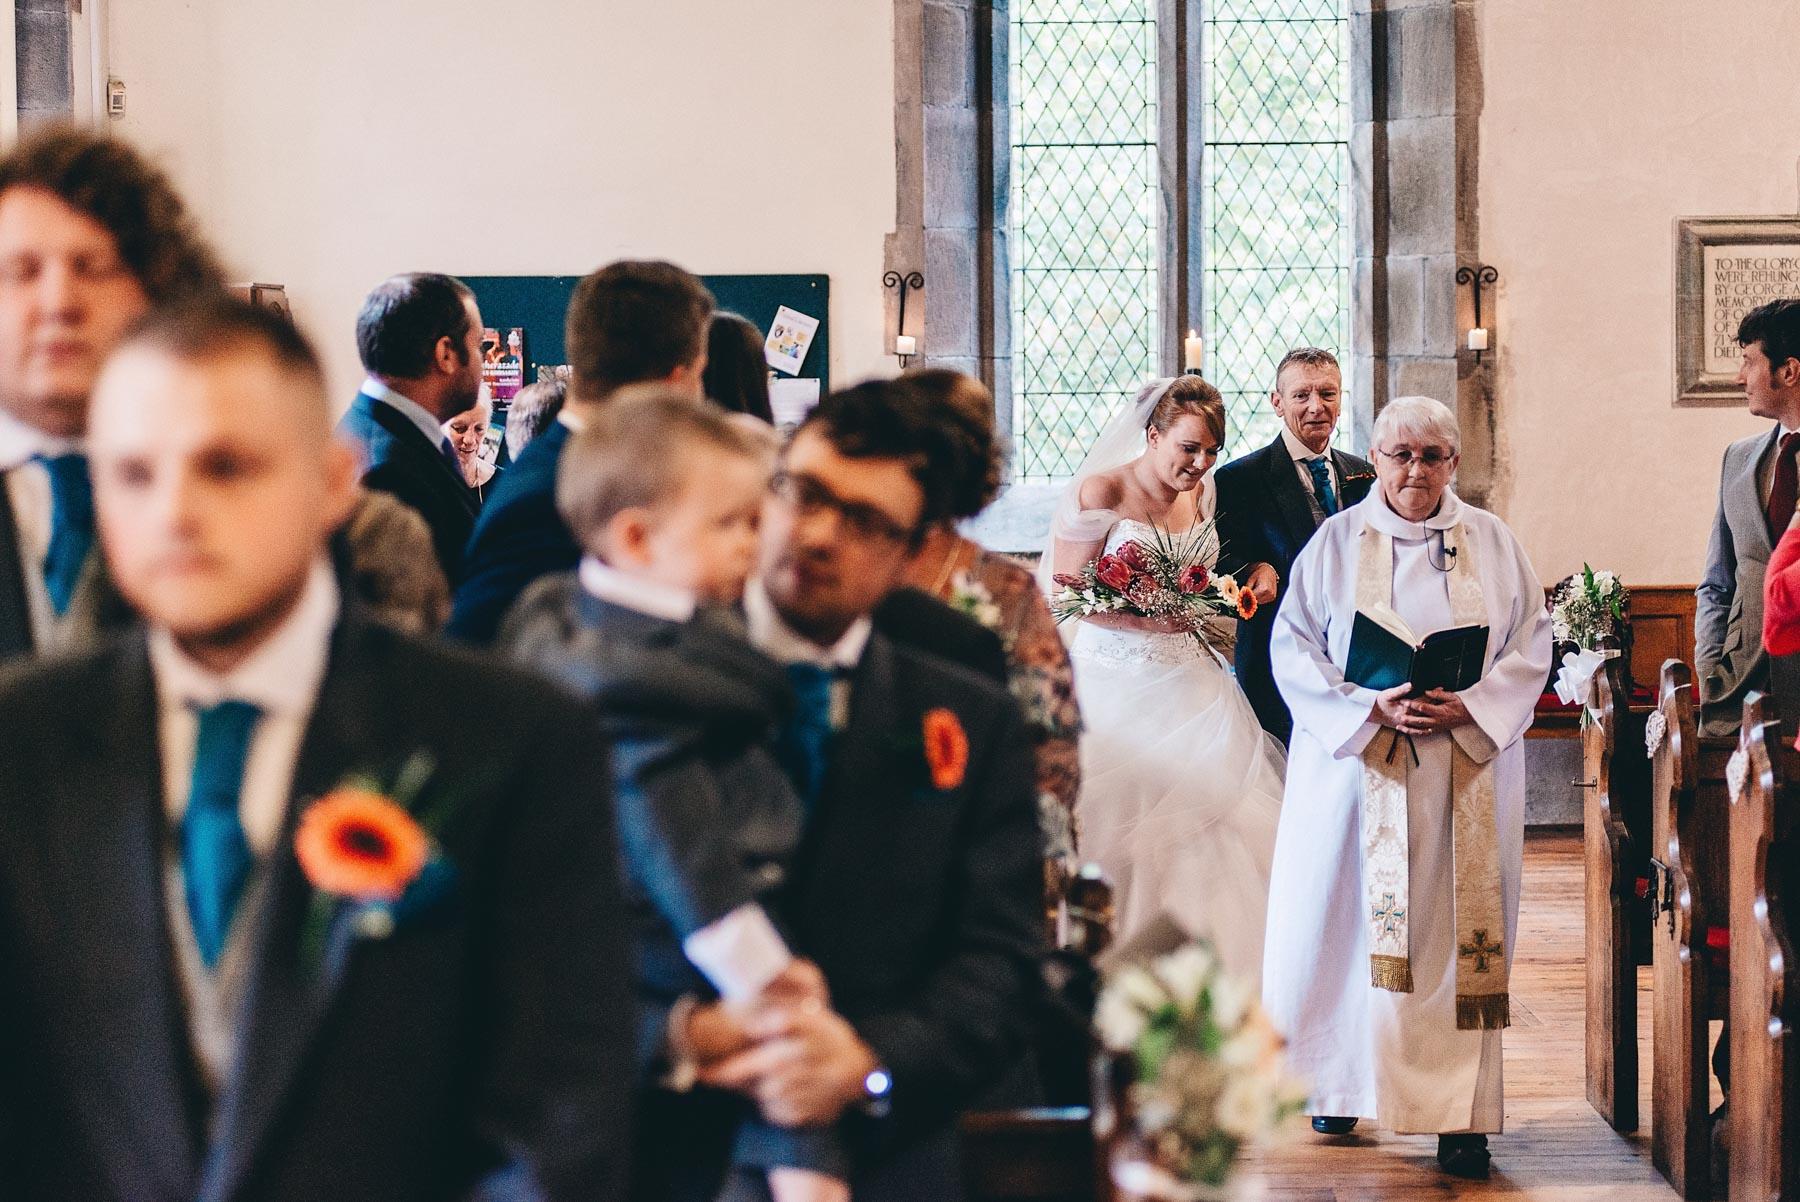 Friezland-Church-Saddleworth-Wedding-47.jpg